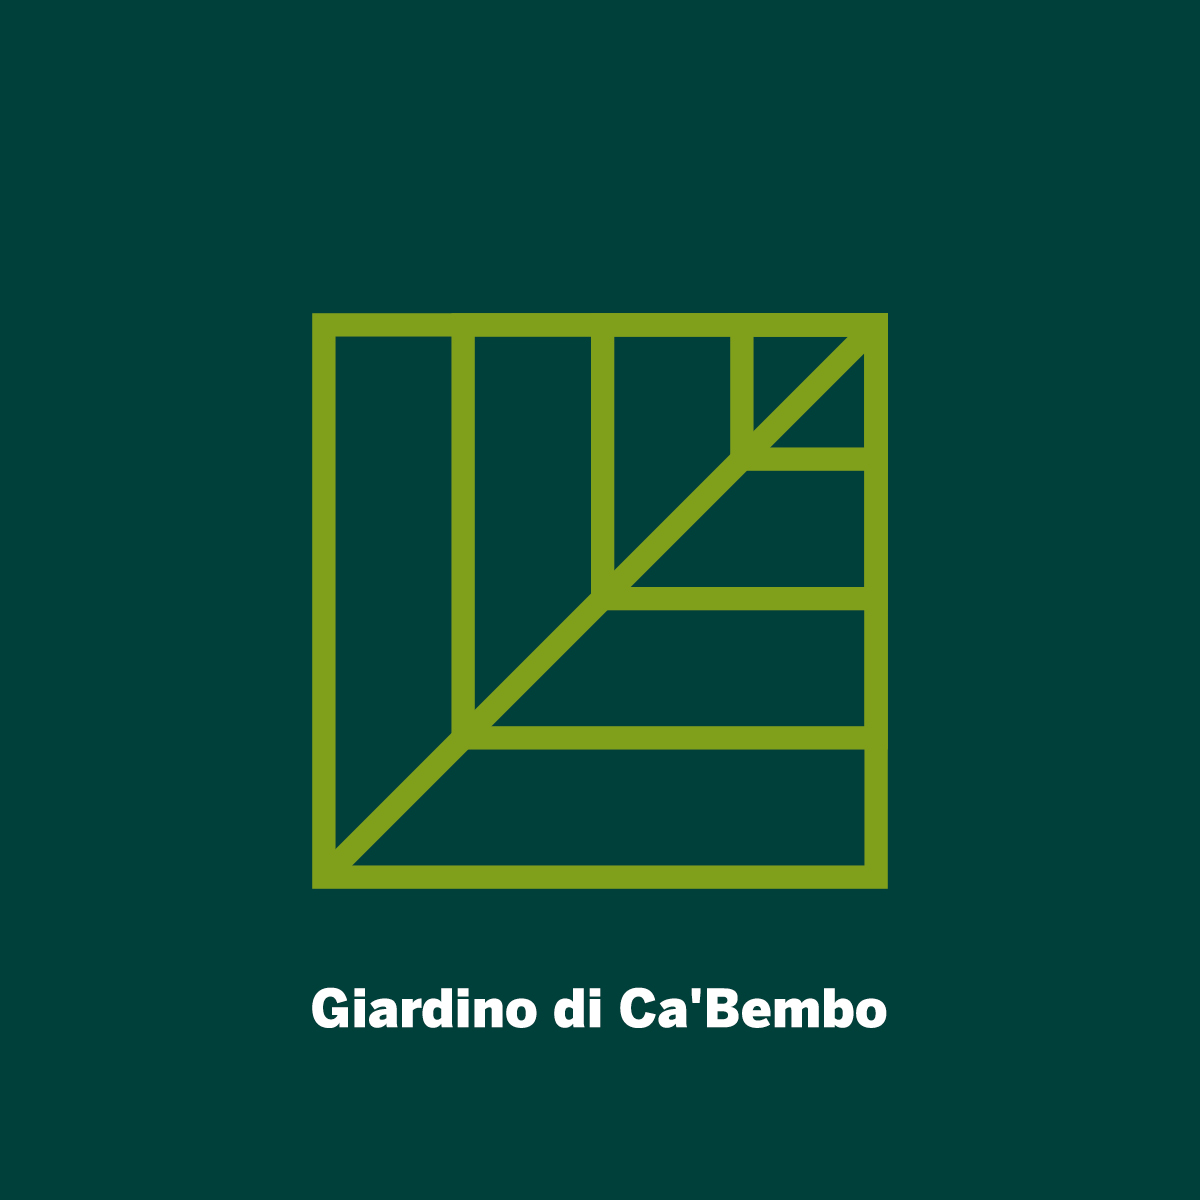 Giardino-di-Ca-Bembo